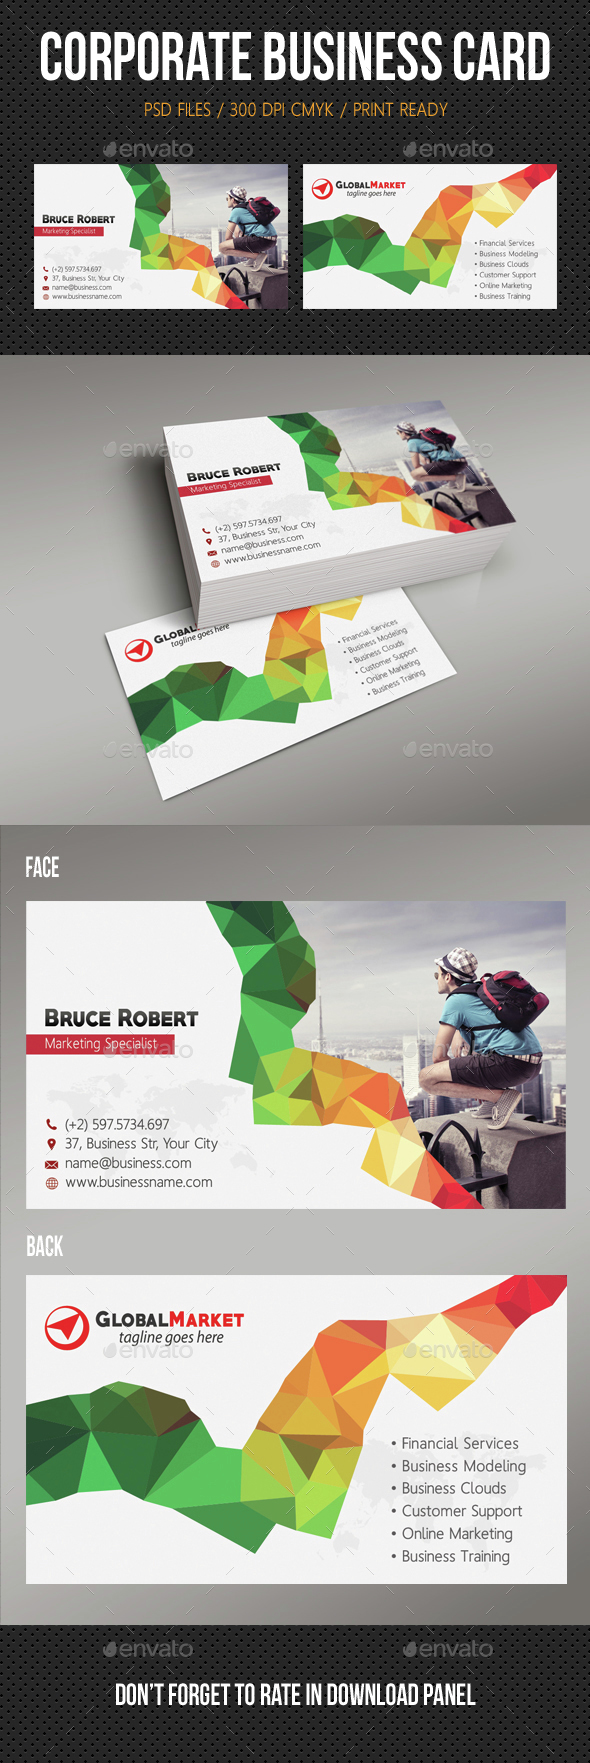 Corporate Business Card 14 - Corporate Business Cards